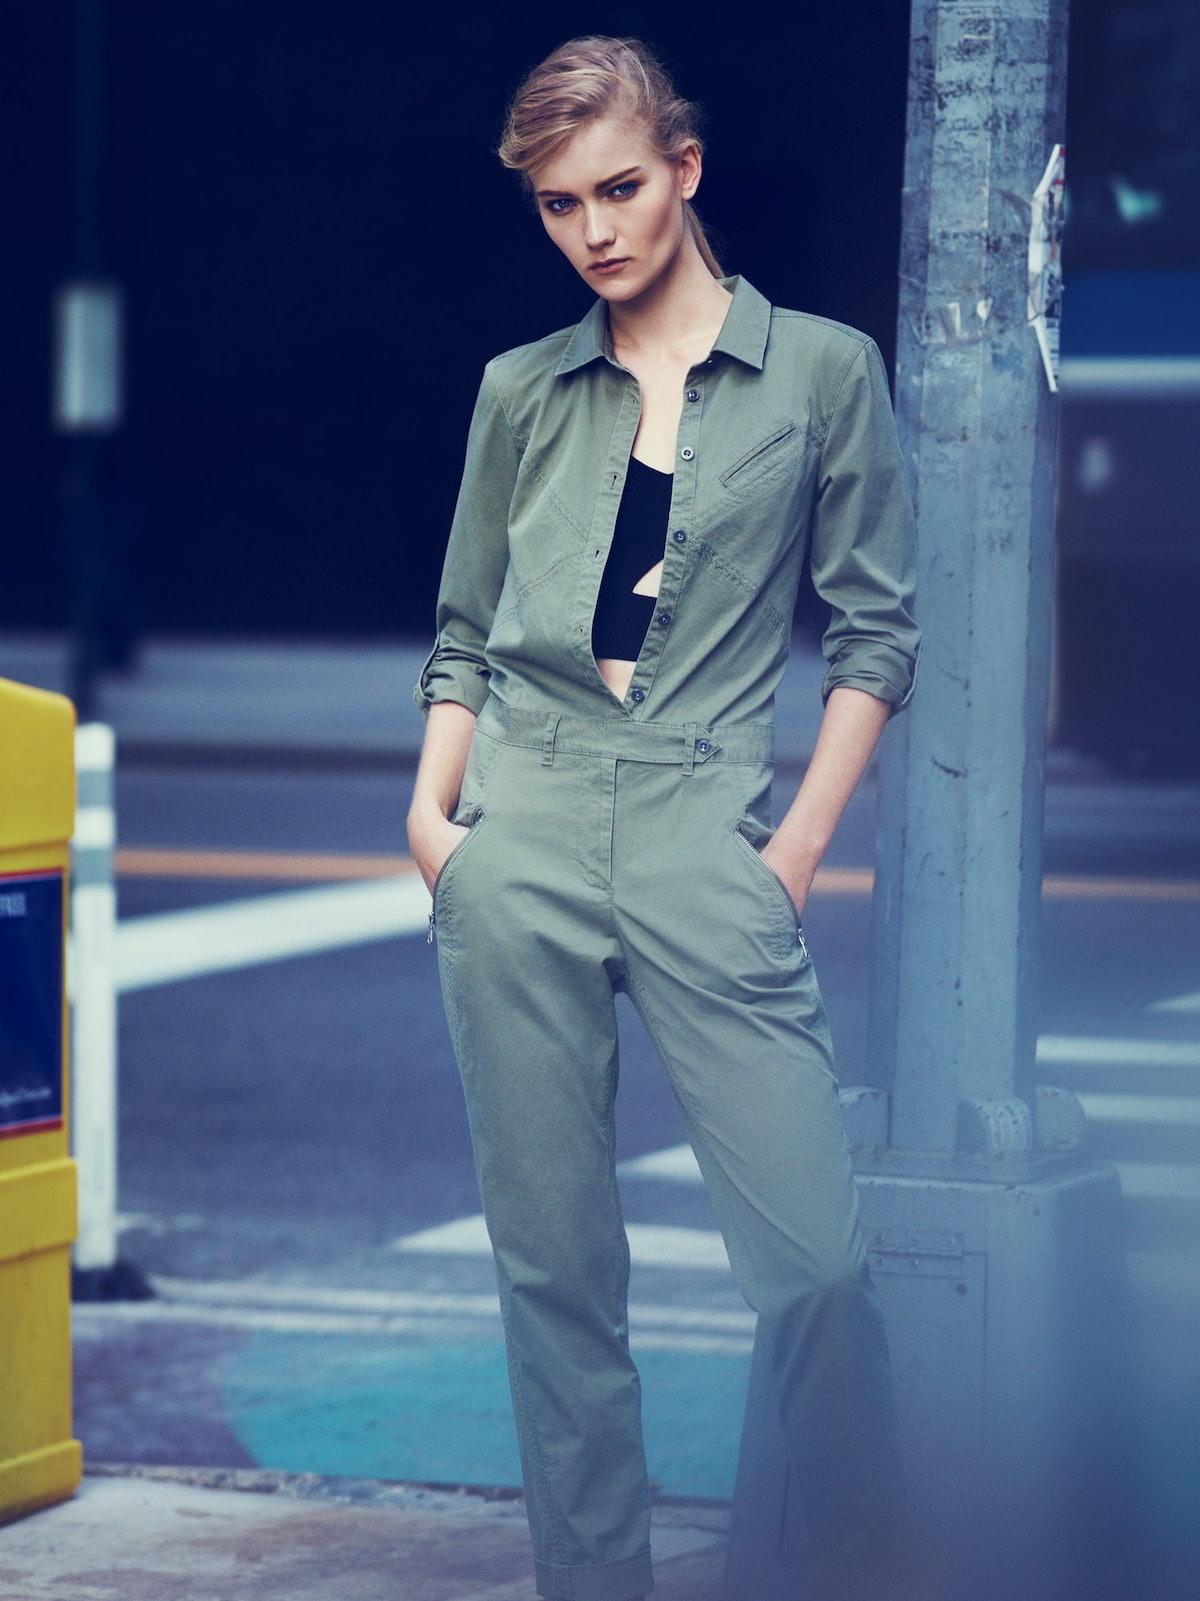 Marc by Marc Jacobs jumpsuit; Paule Ka bra top.